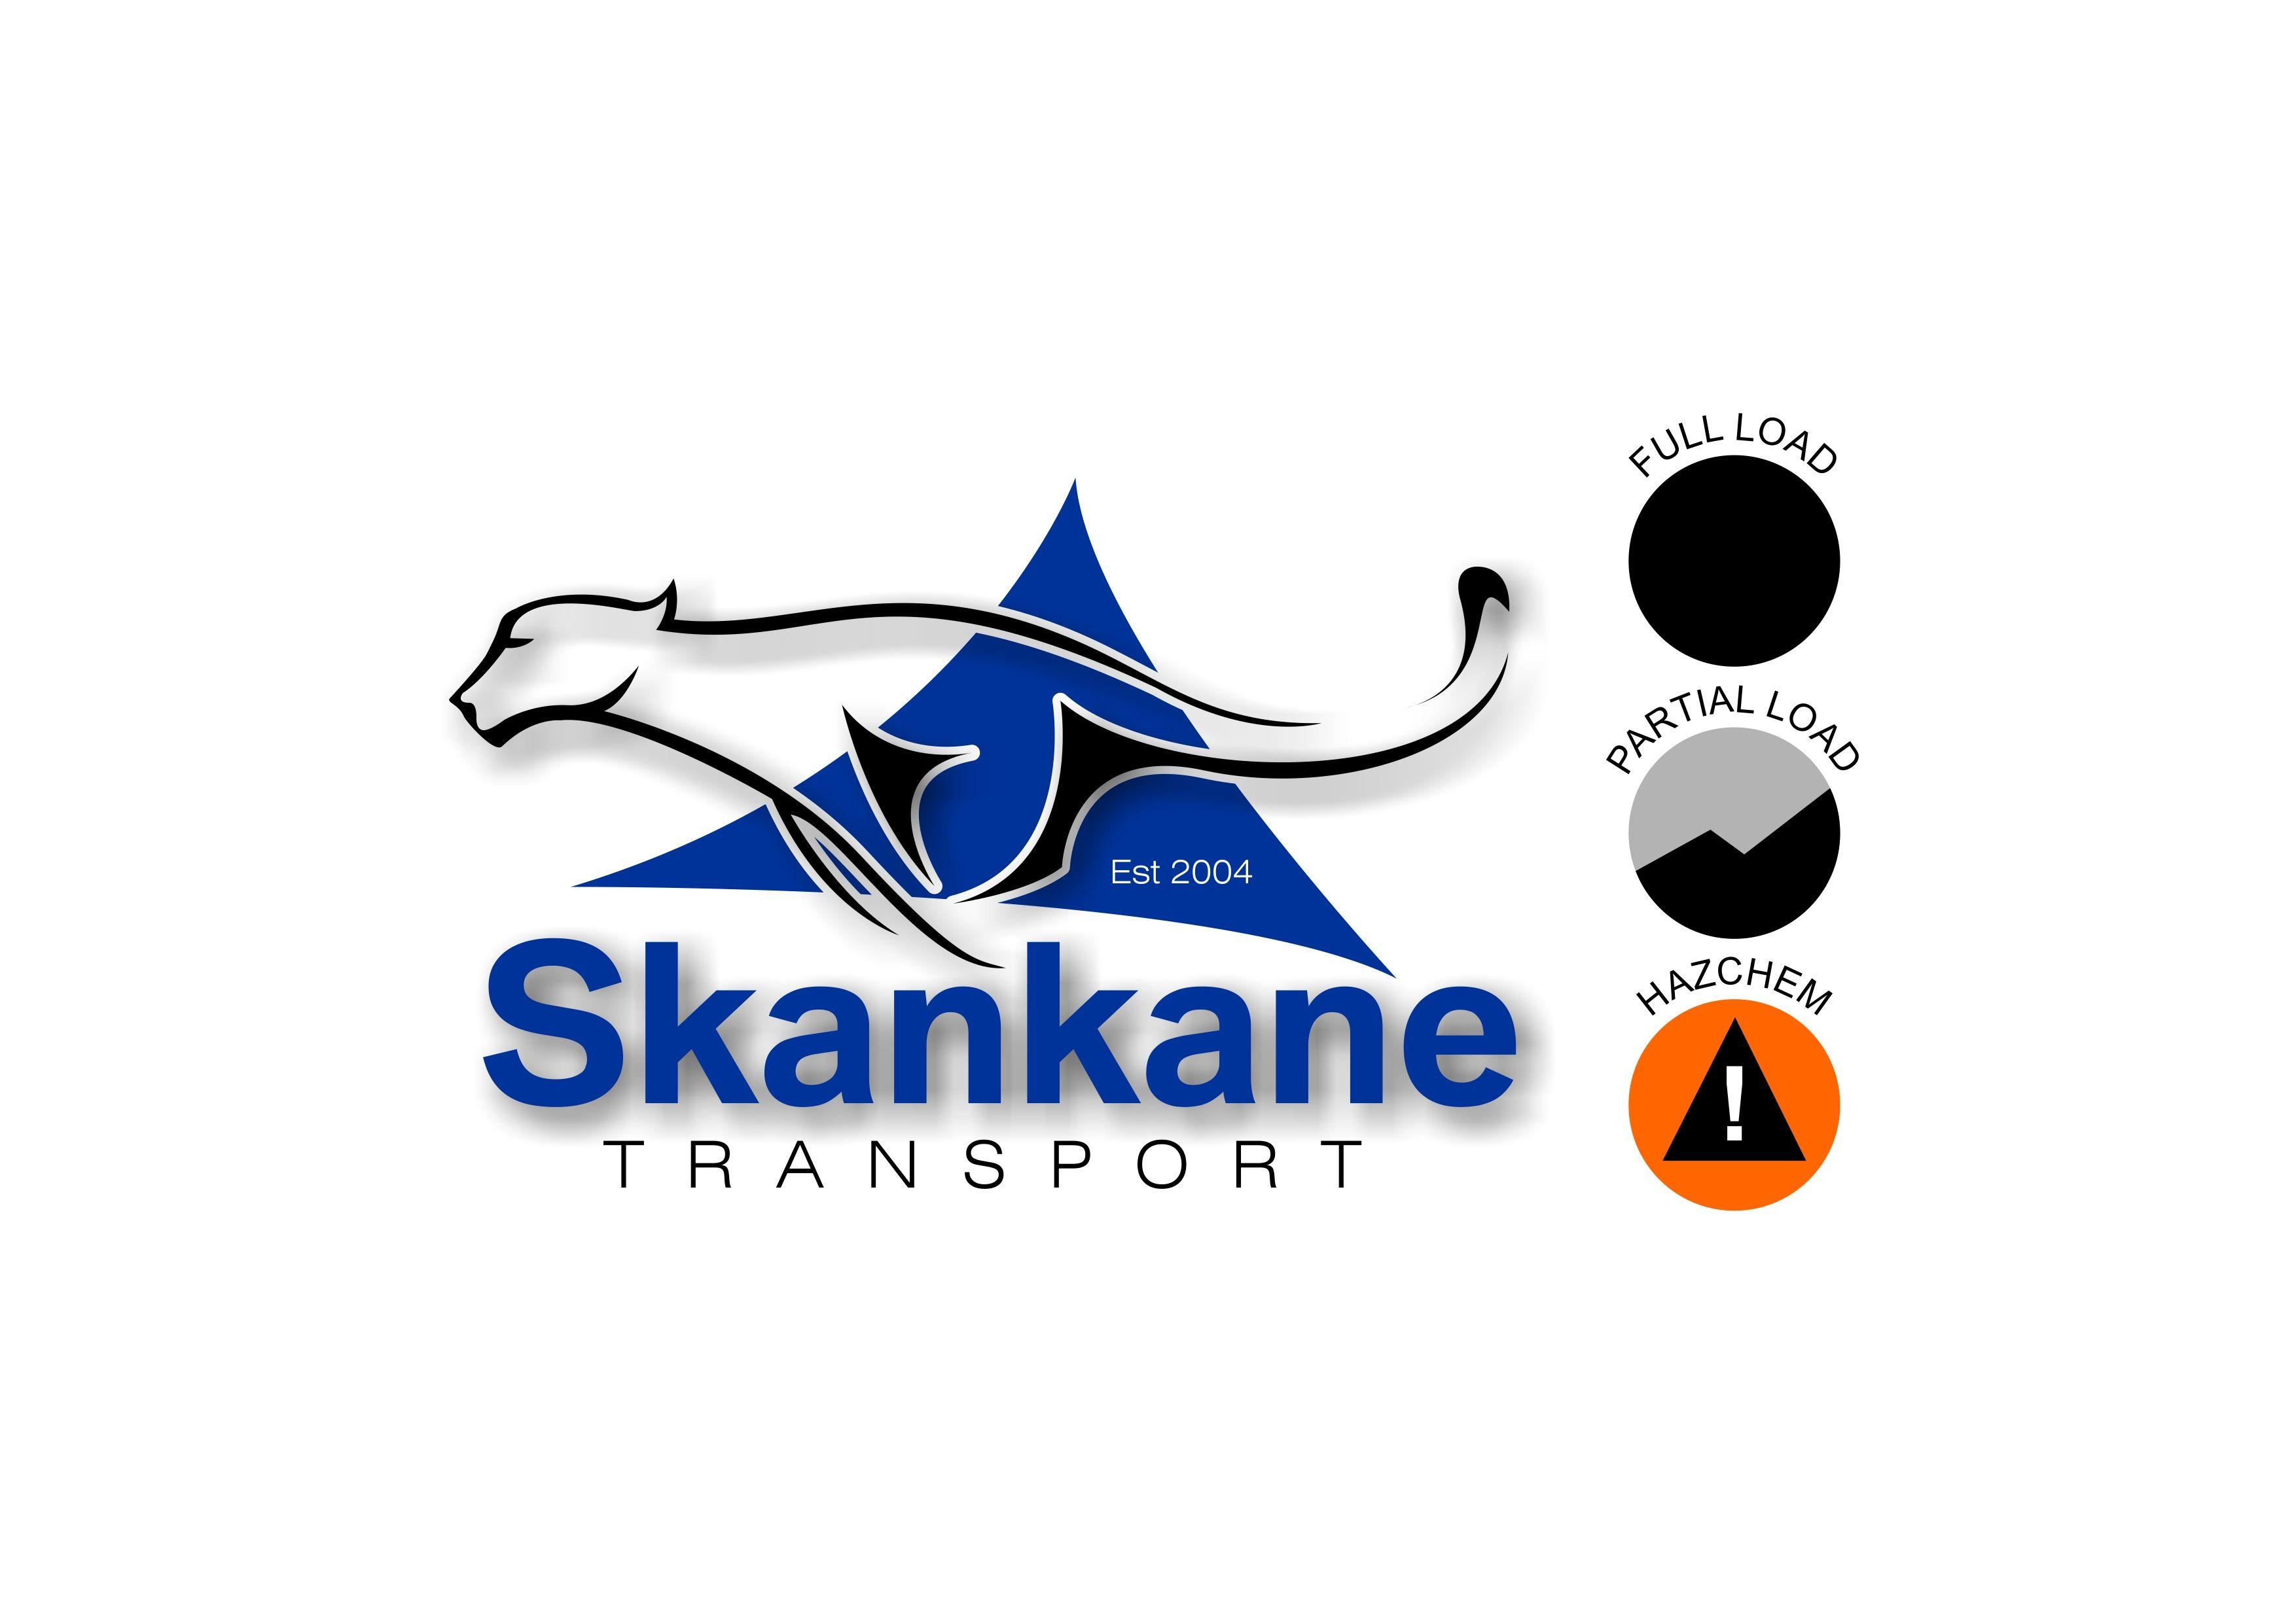 Who is Skankane Transport? http//www.skankane.co.za